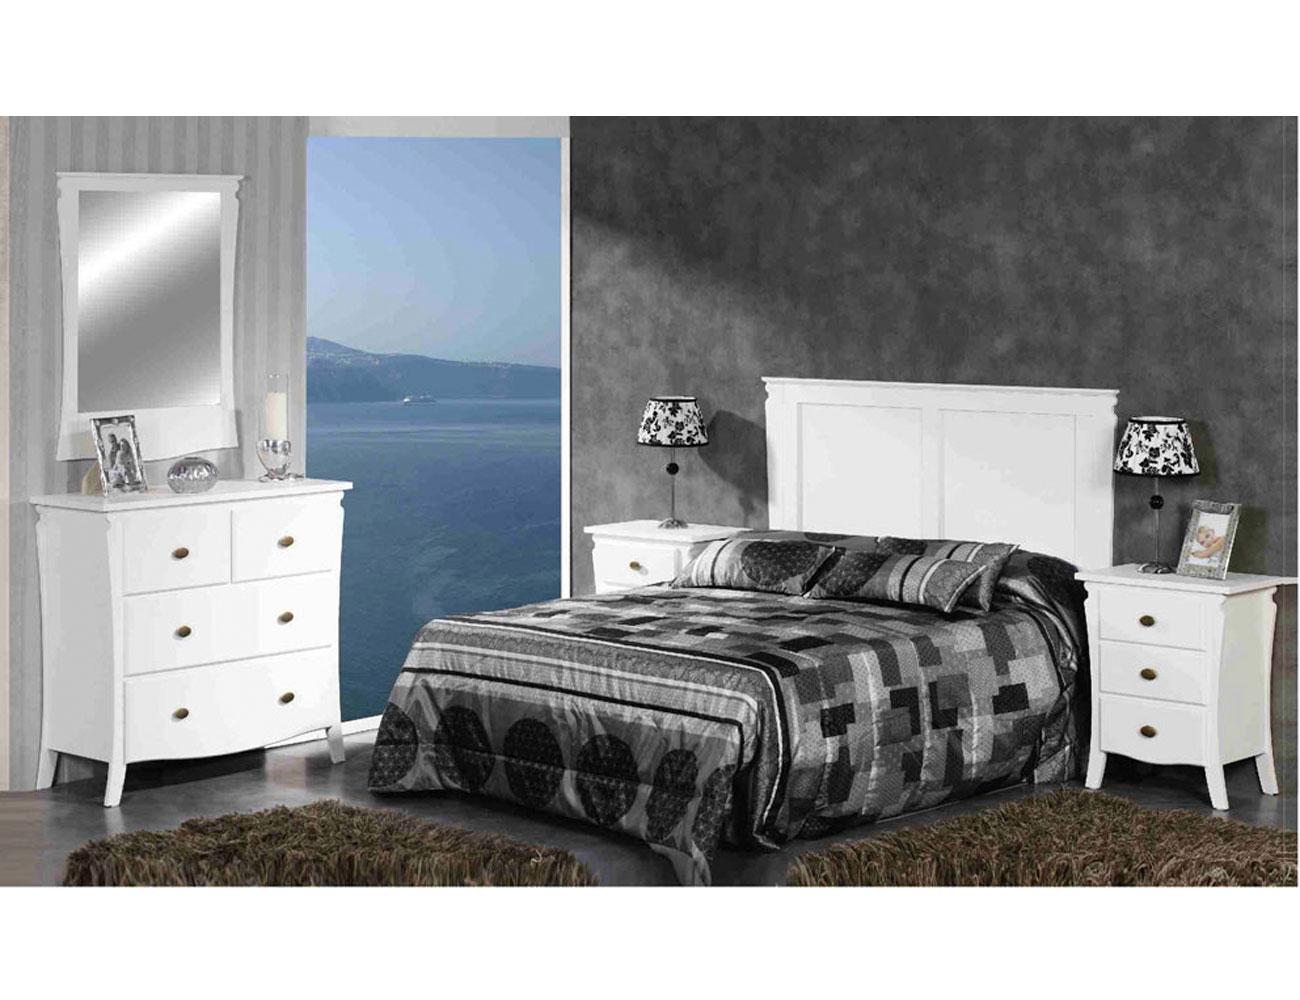 Dormitorio matrimonio blanco lacado madera dm2